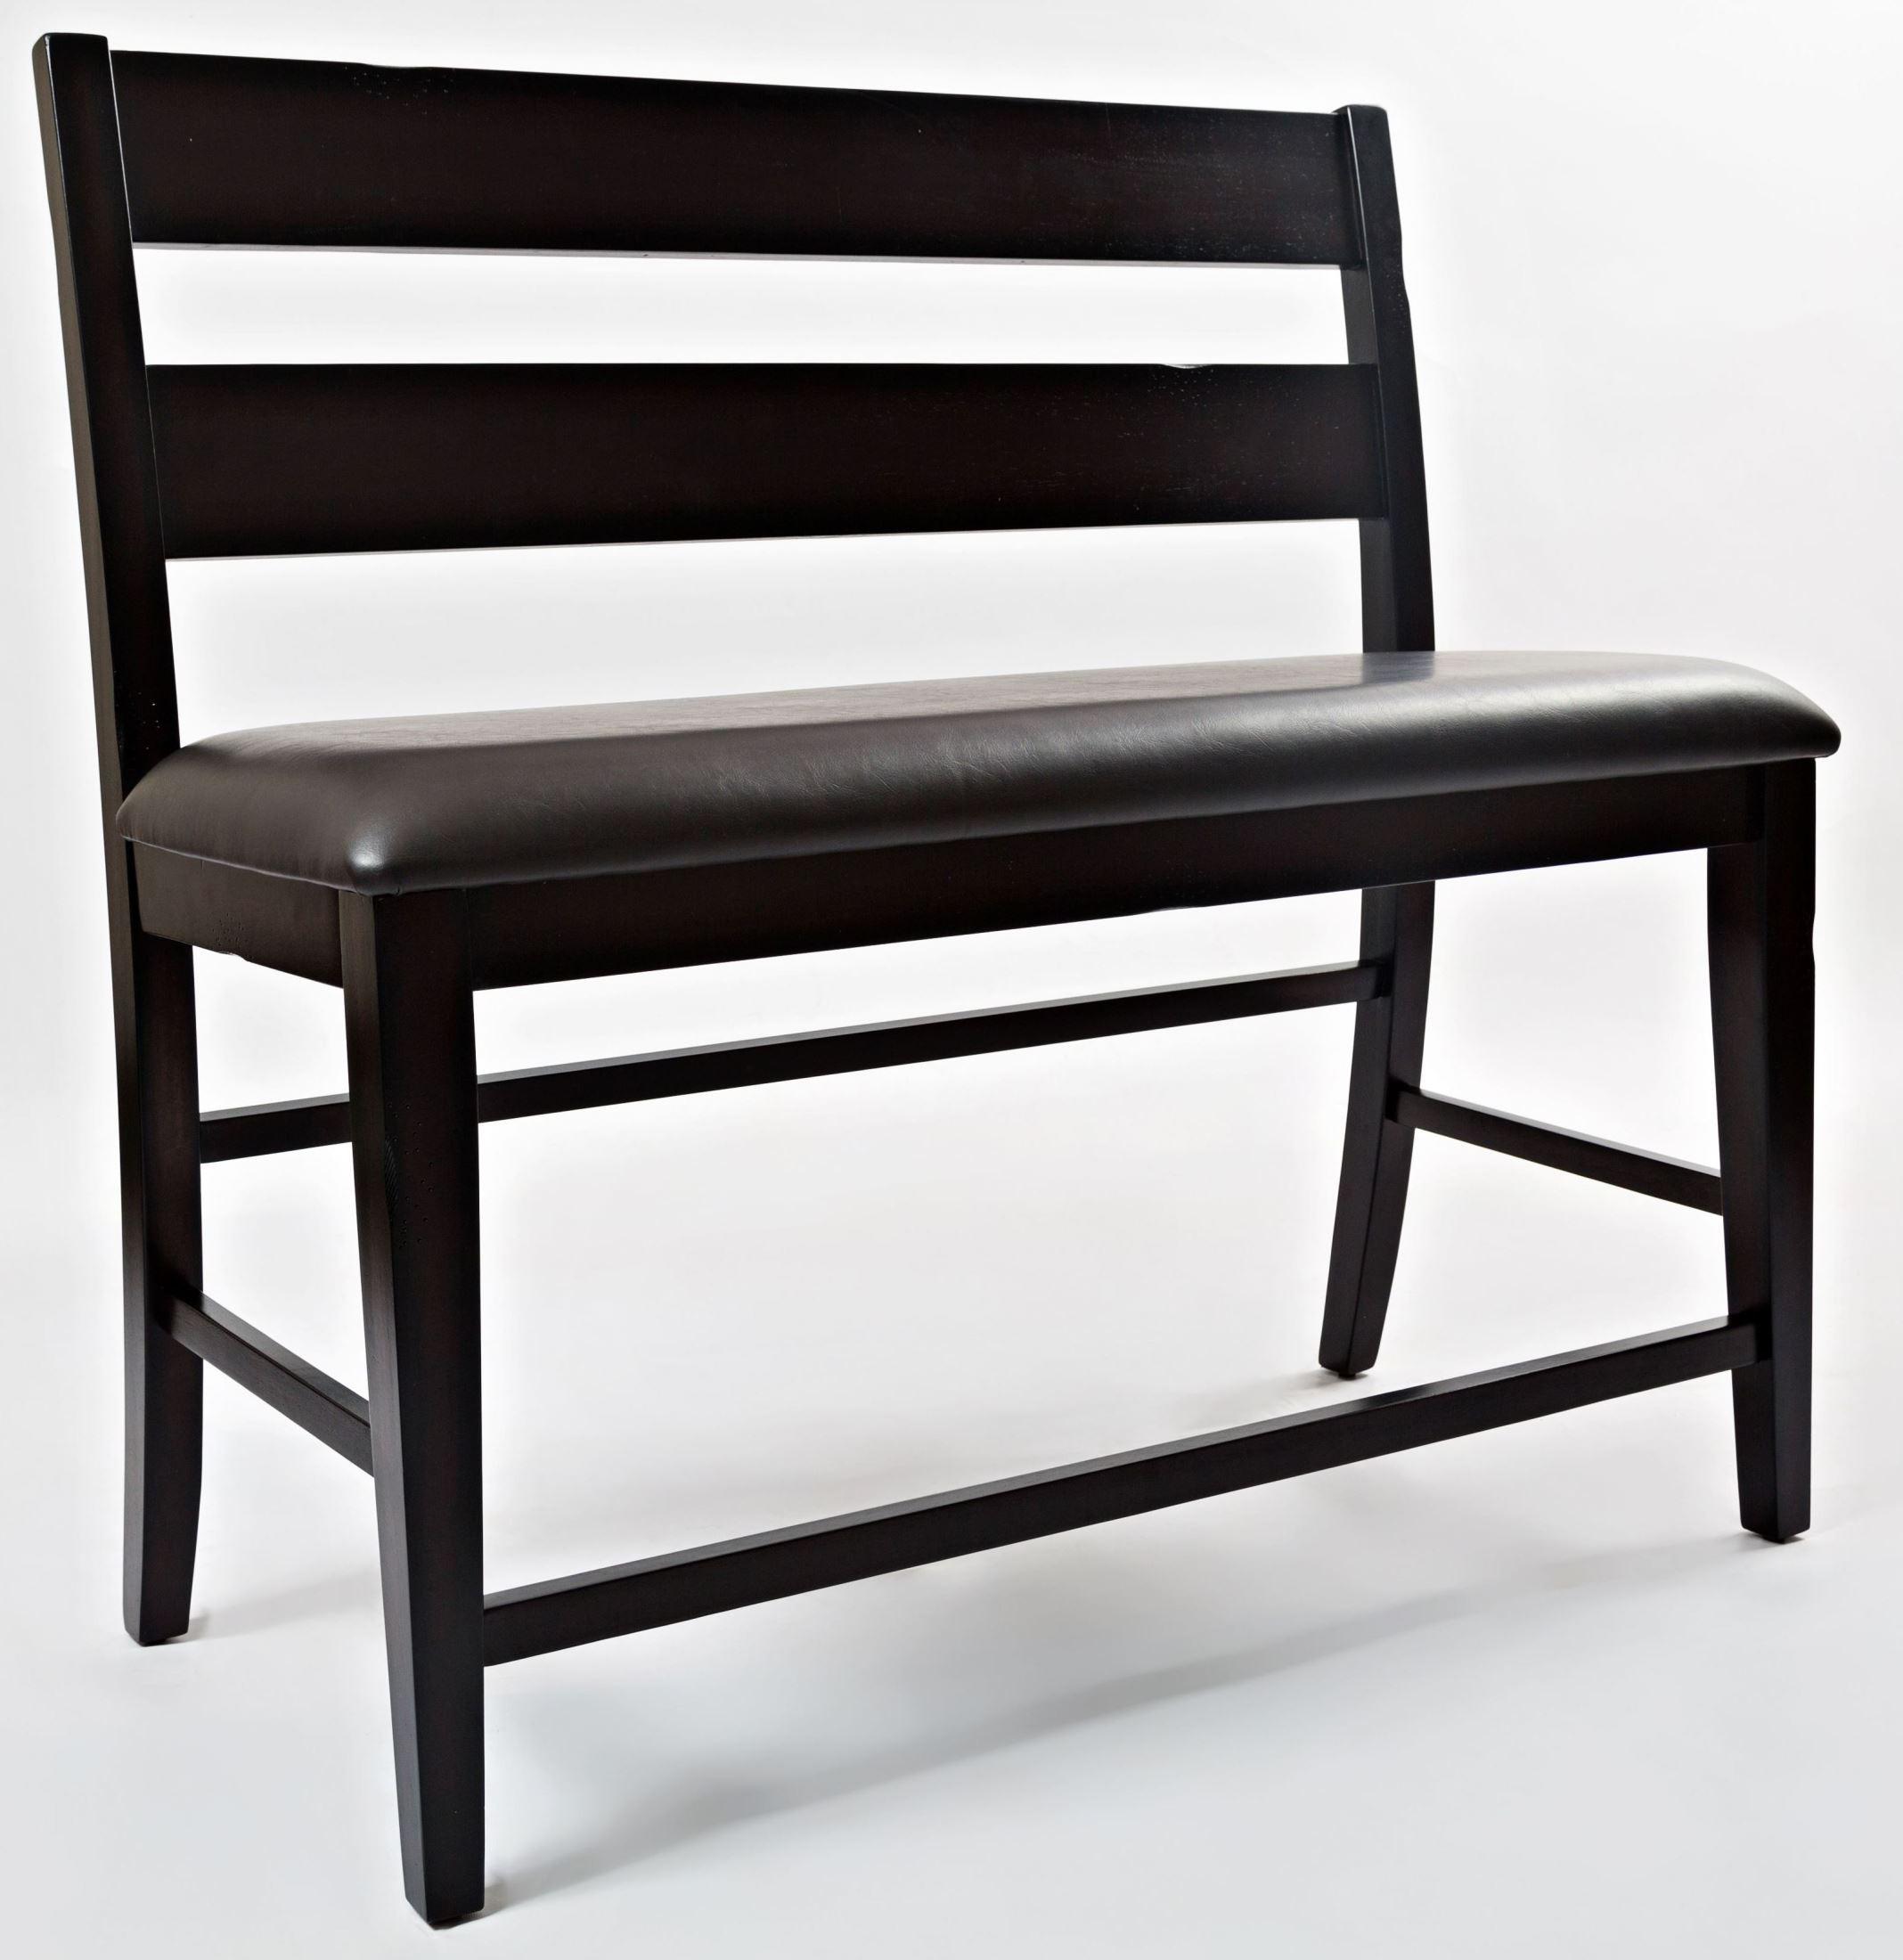 Dark Rustic Prairie Counter Height Bench From Jofran Coleman Furniture